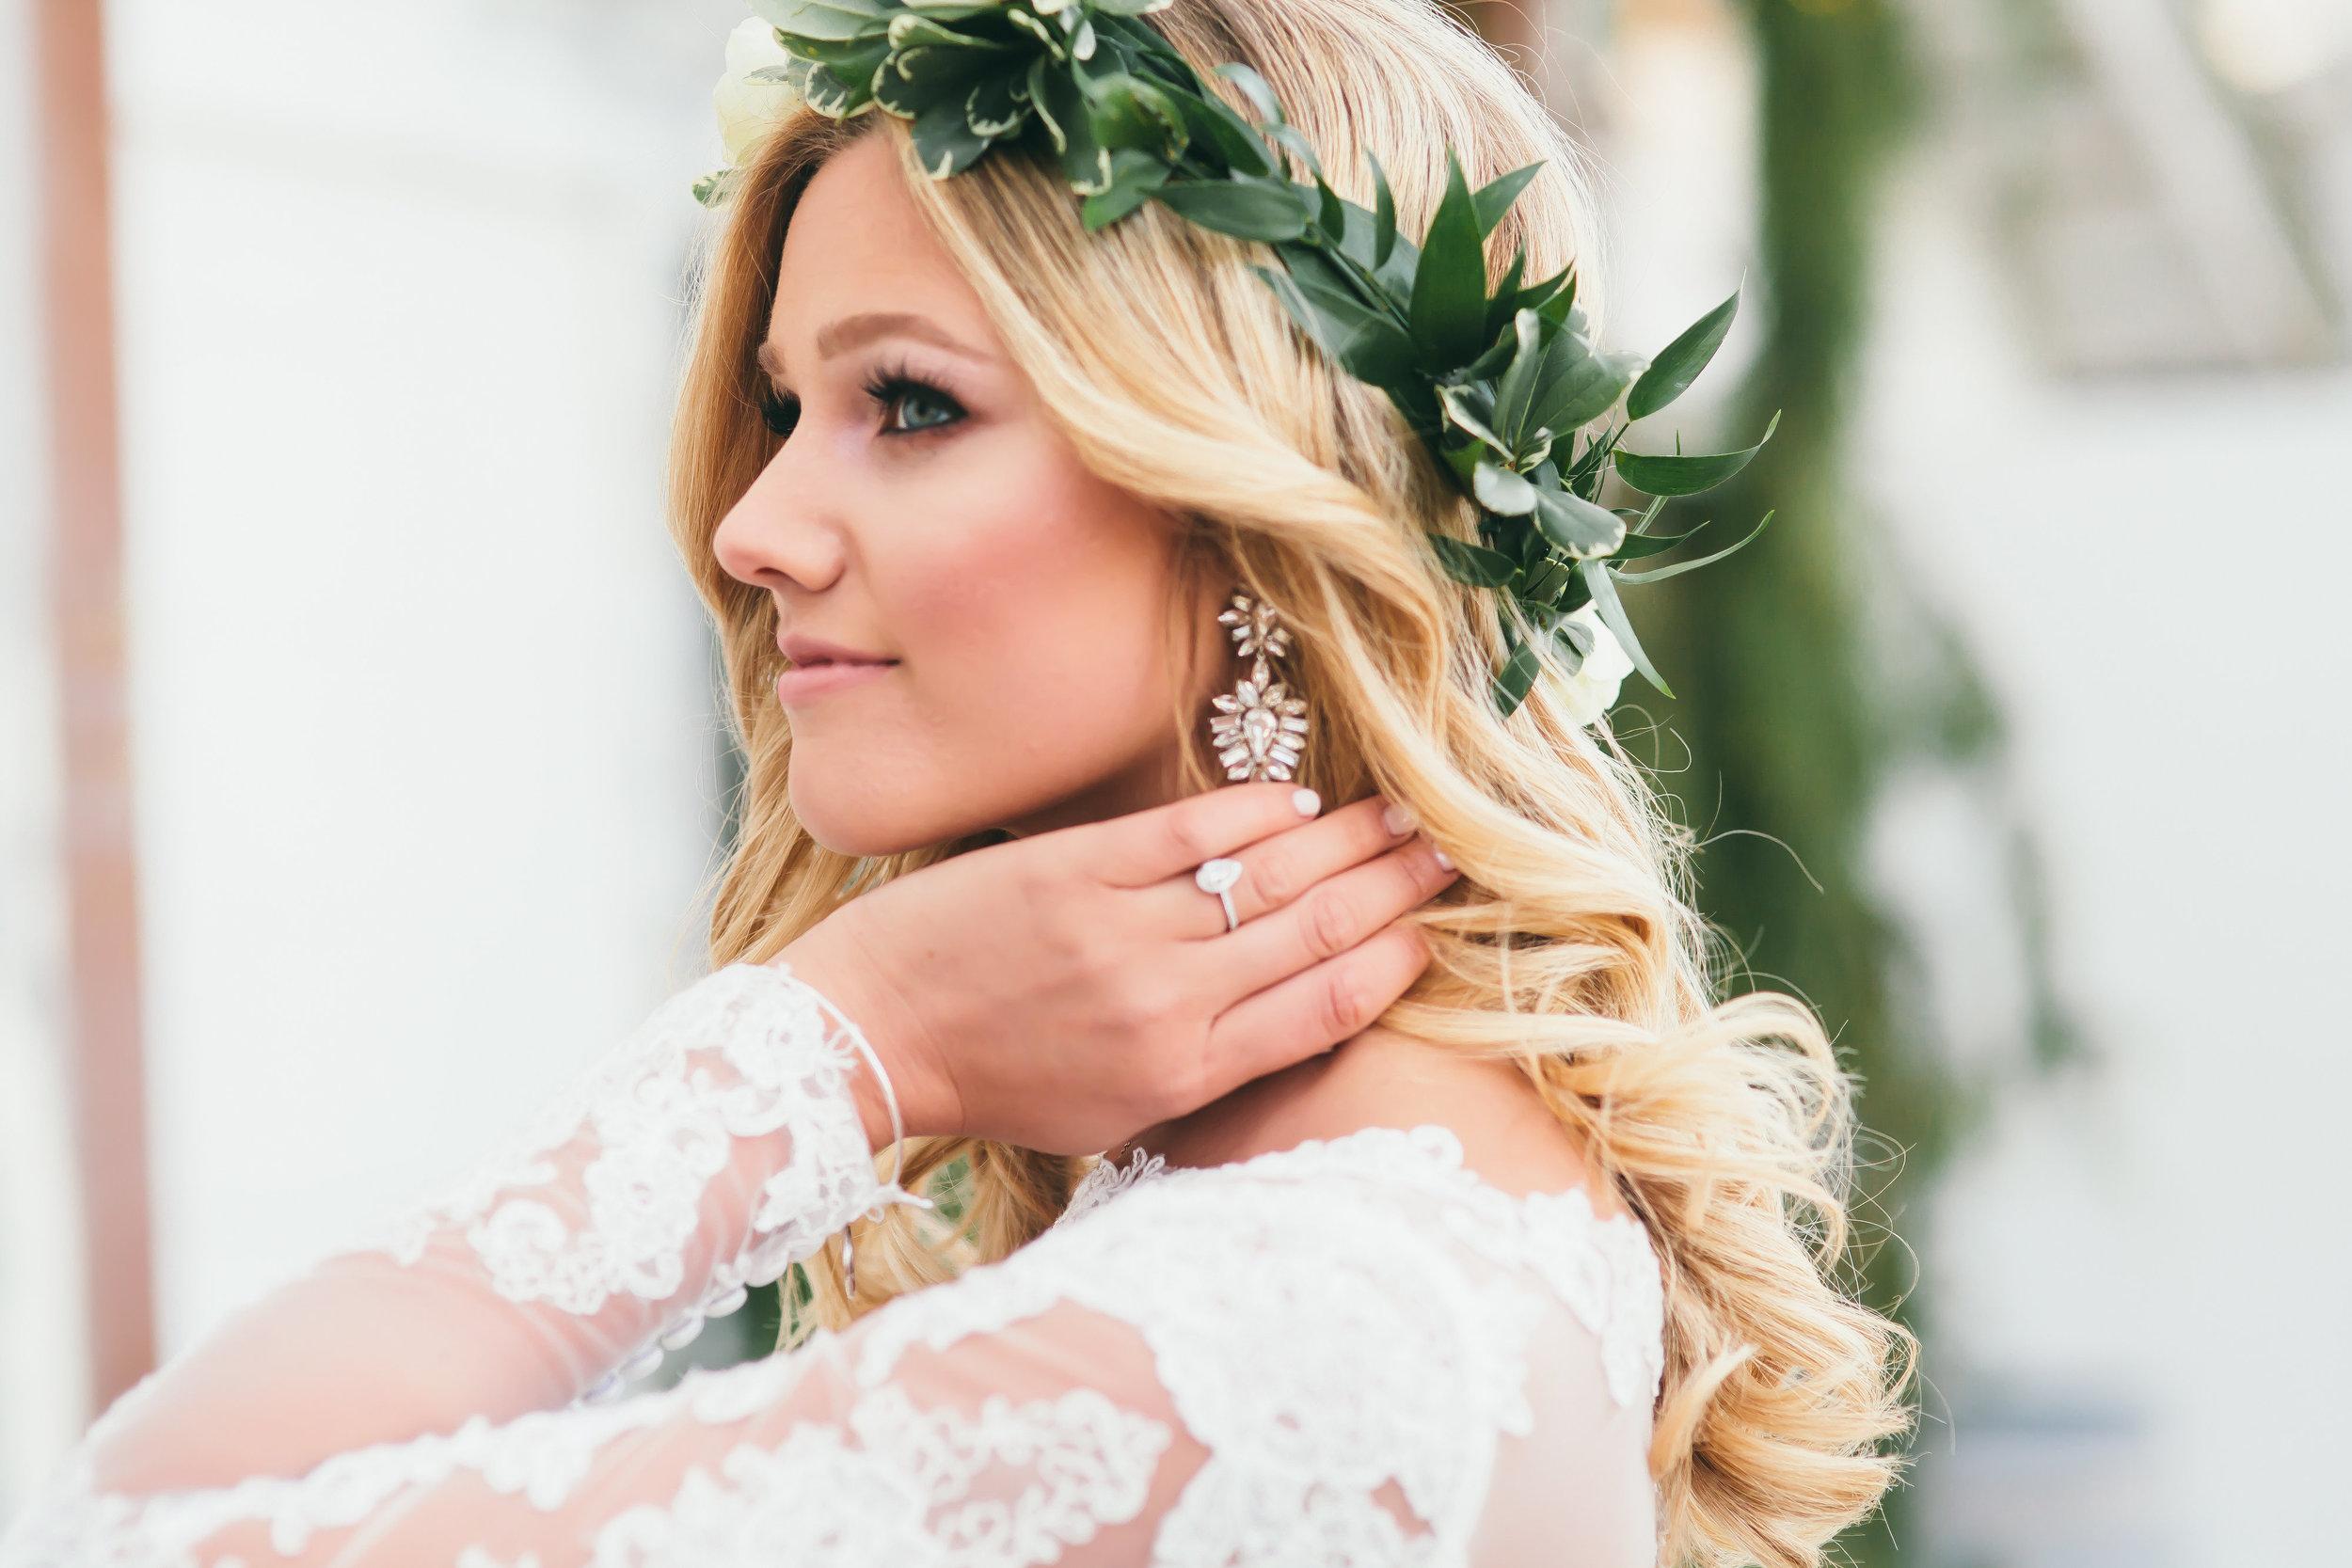 Bre Sheppard Wedding Dress - Flower Grown - Greenery - Makeup Inspo - Bridal Style